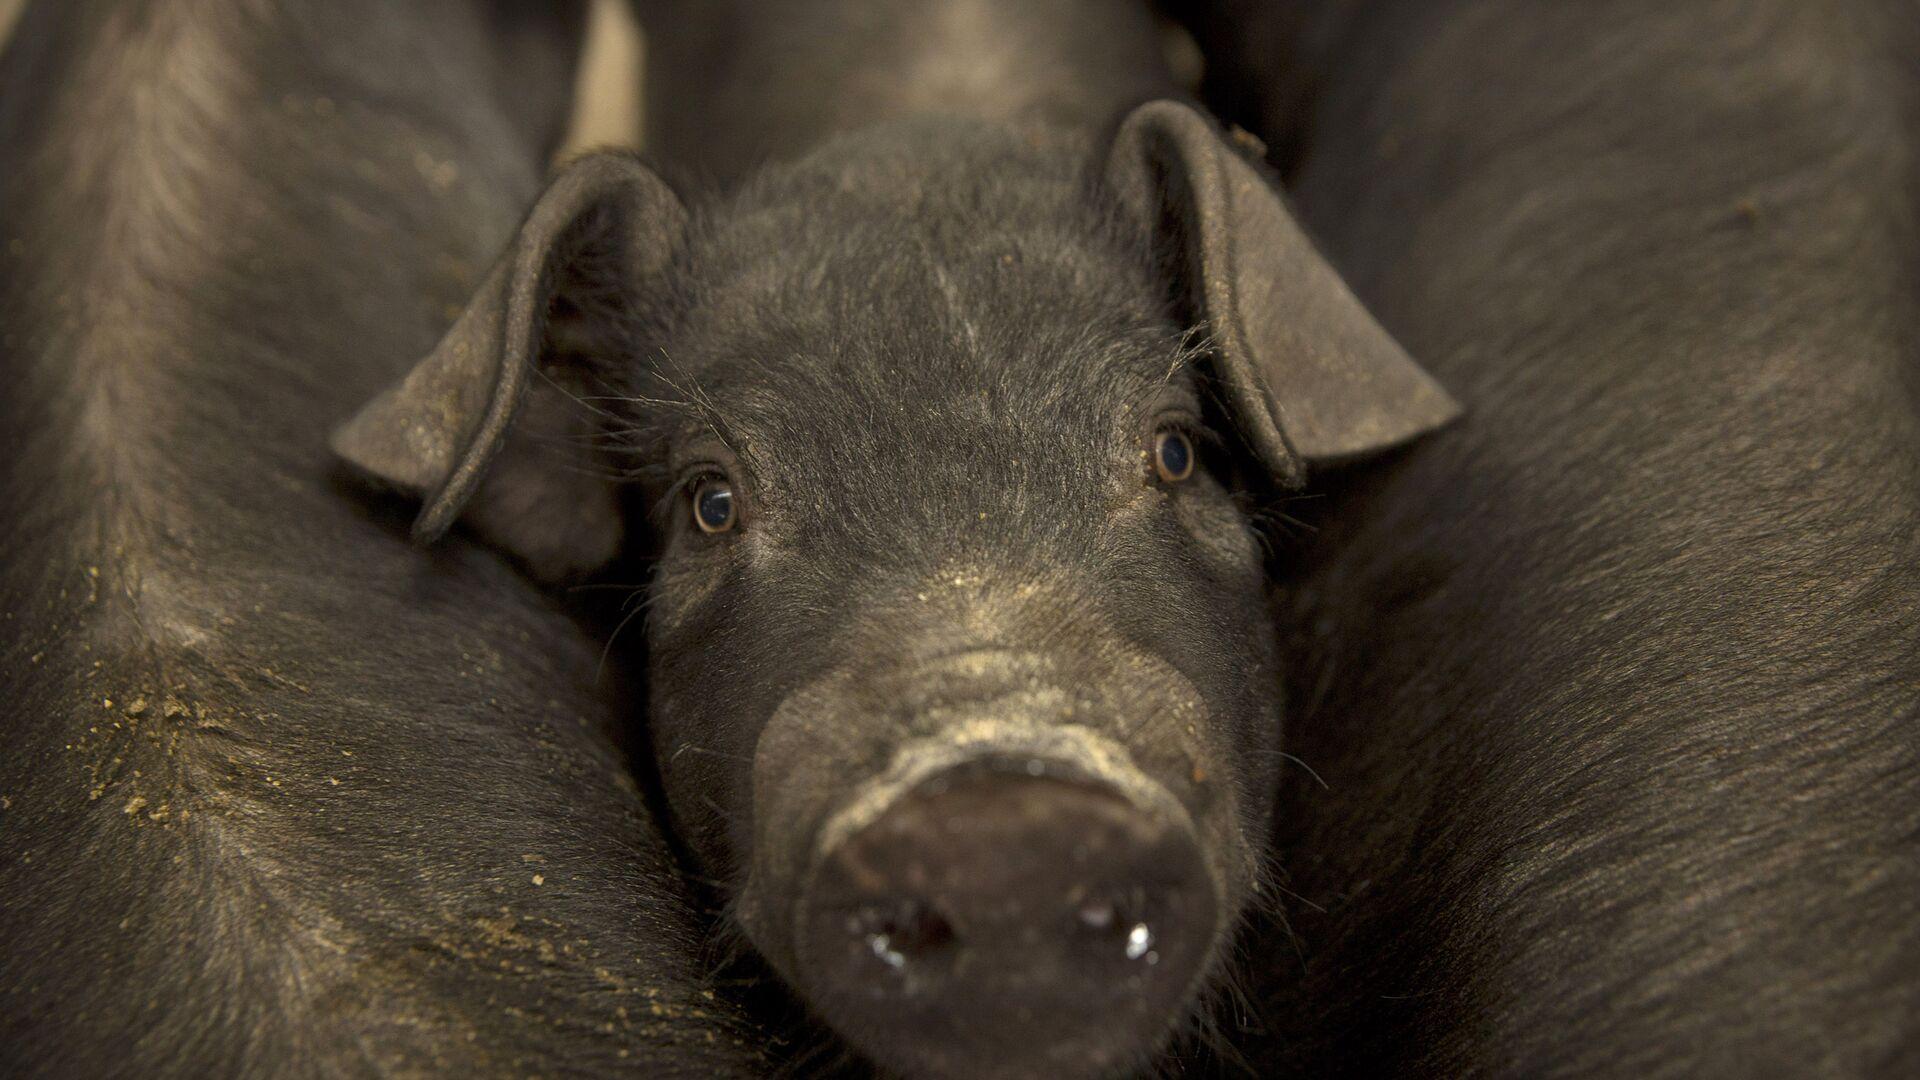 Cerdo pequeño de una granja ubicada en la villa de Jiangjiaqiao, norte de China - Sputnik Mundo, 1920, 16.07.2021